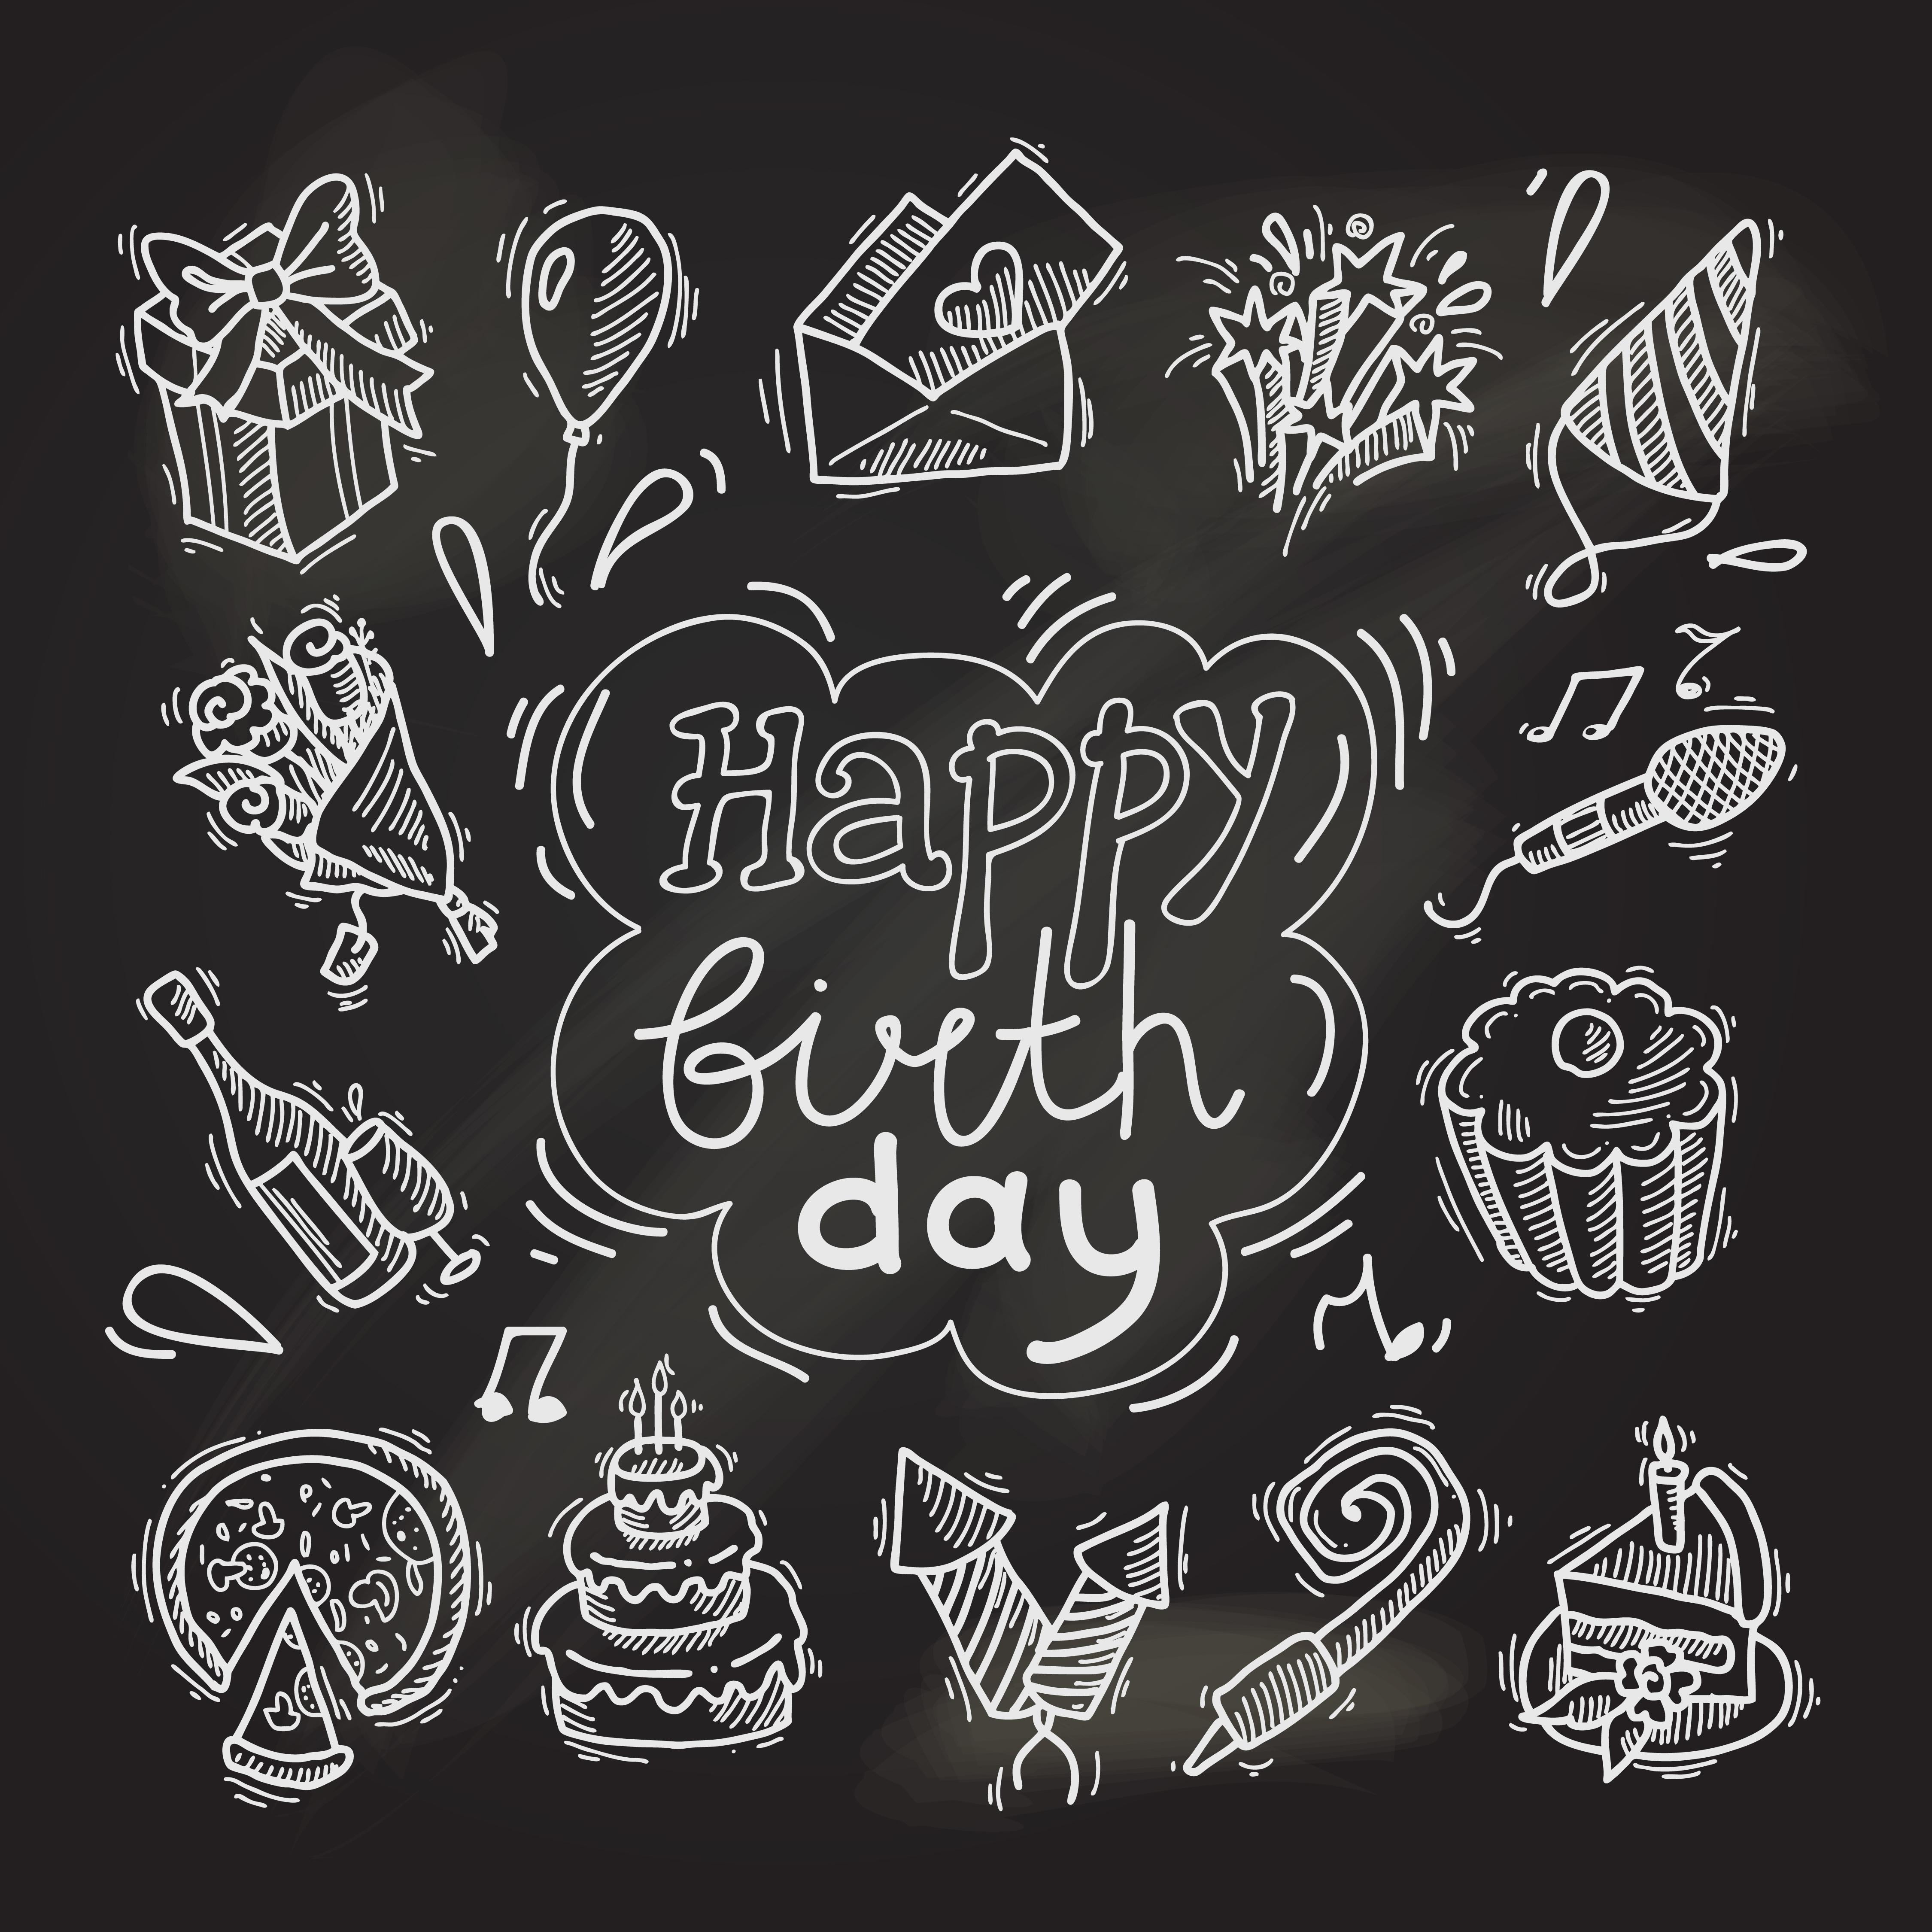 Birthday Sketch Chalkboard Download Free Vector Art